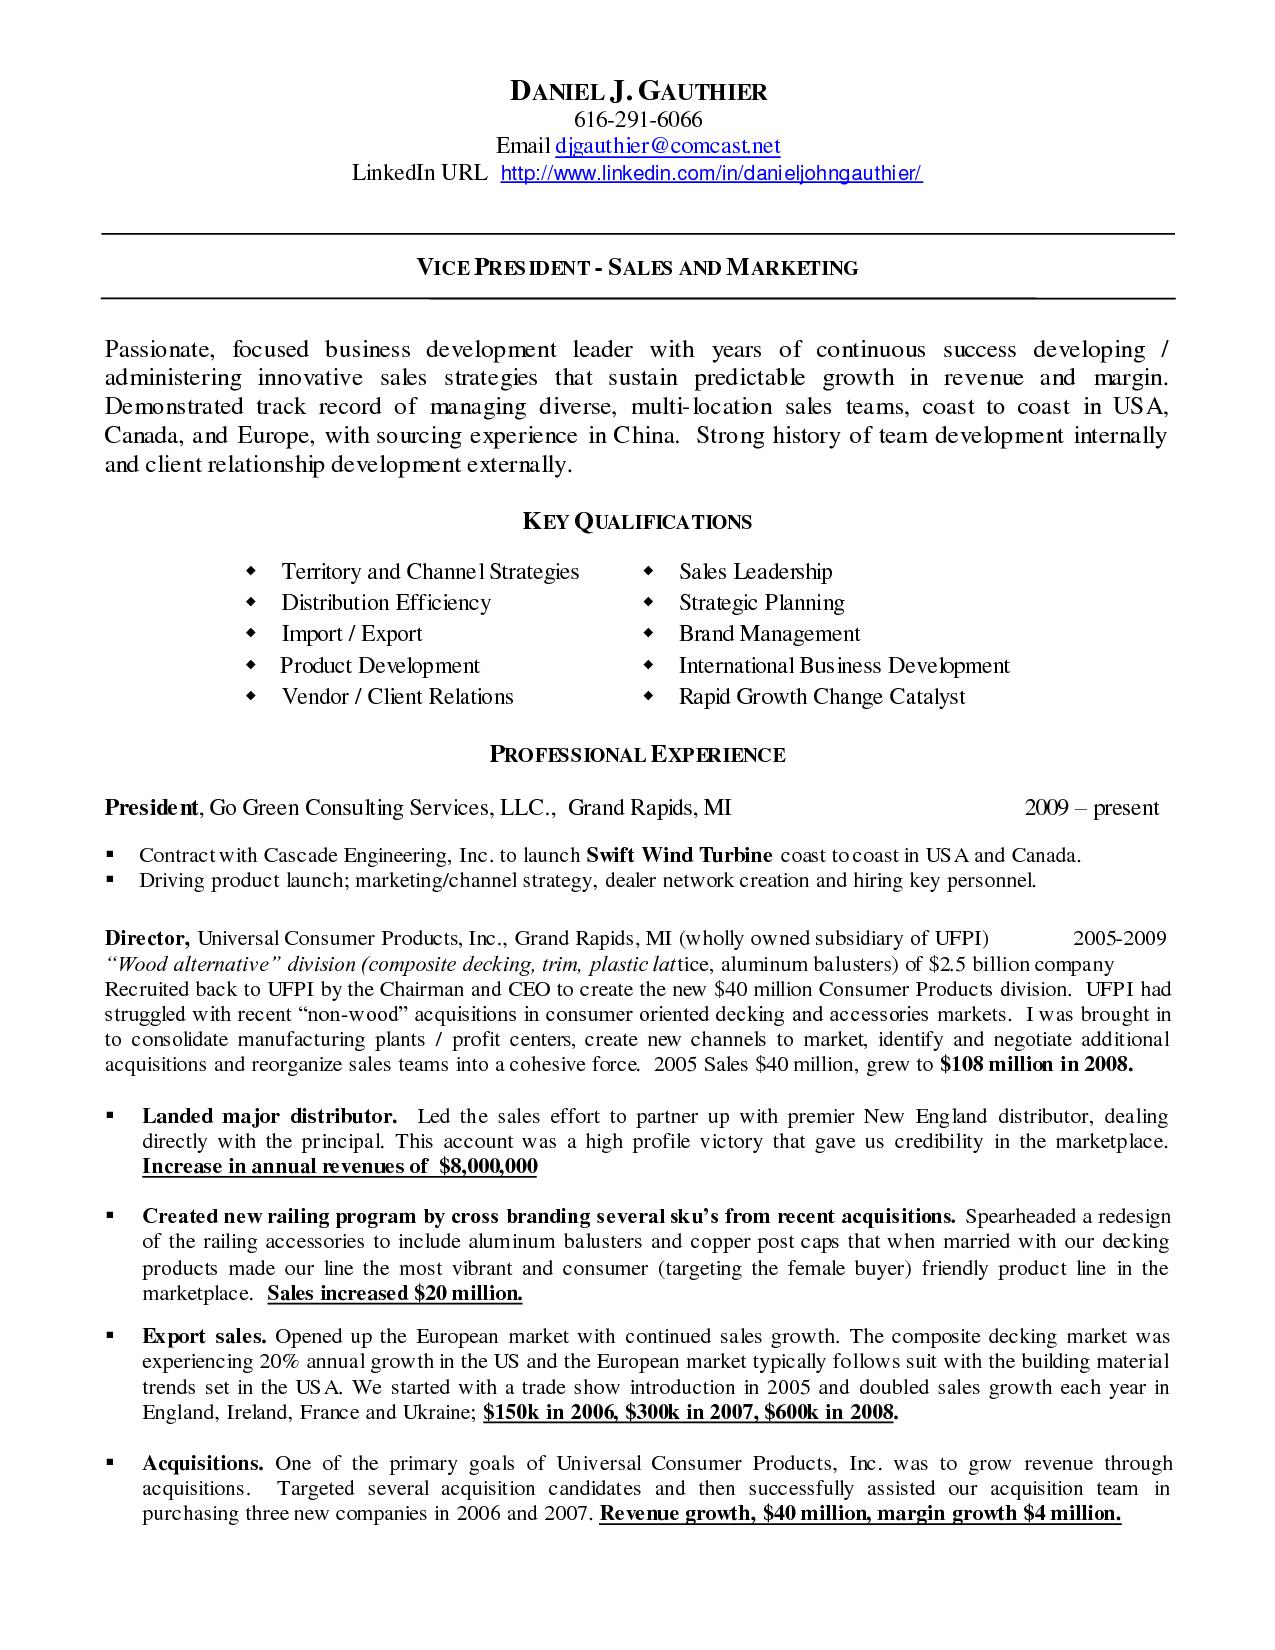 combinationhybrid resume examples